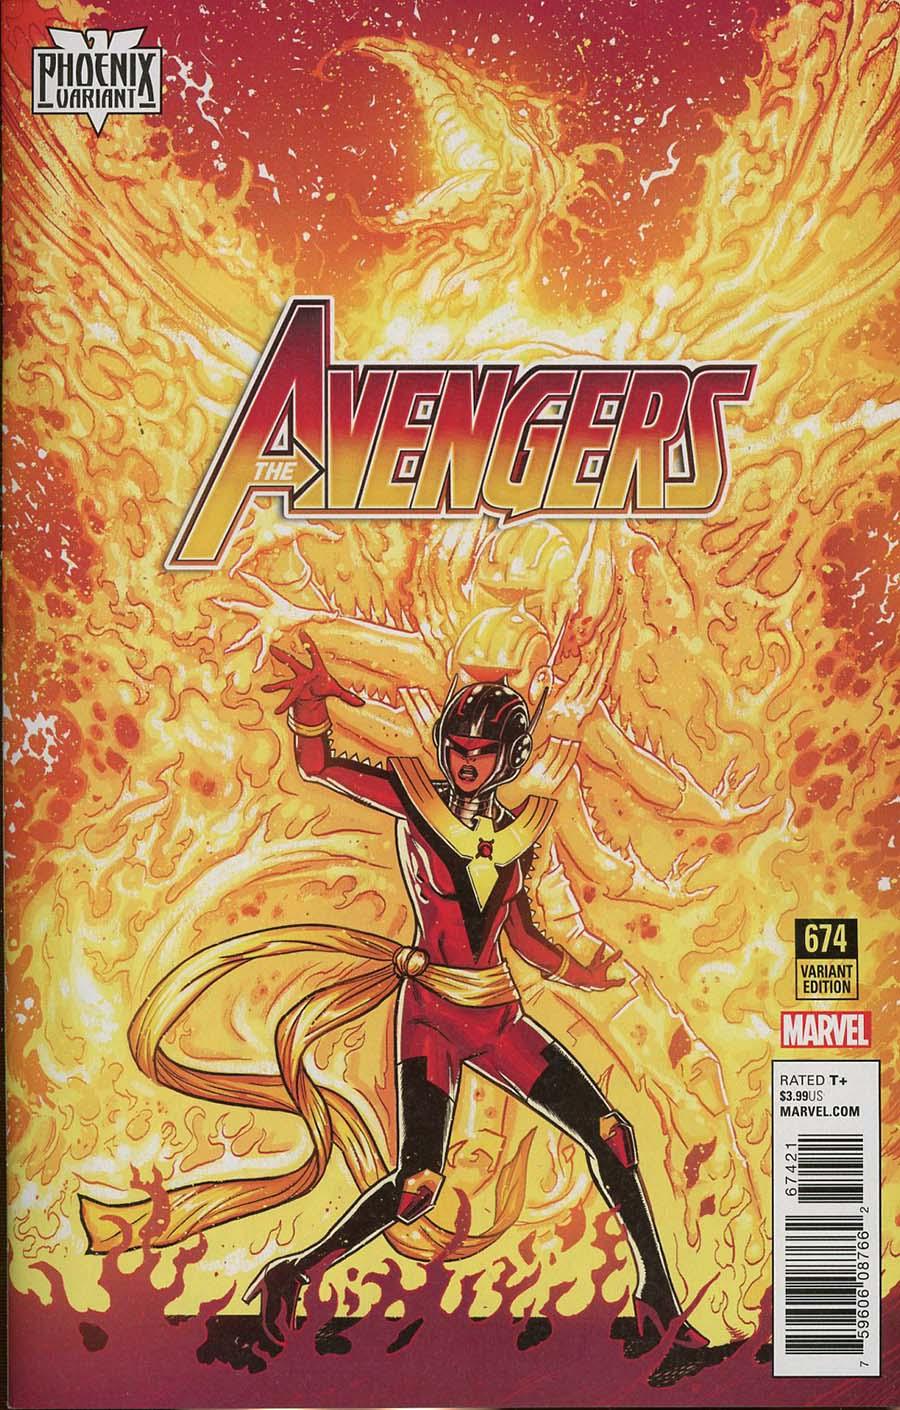 Avengers Vol 1 674 Phoenix Variant.jpg